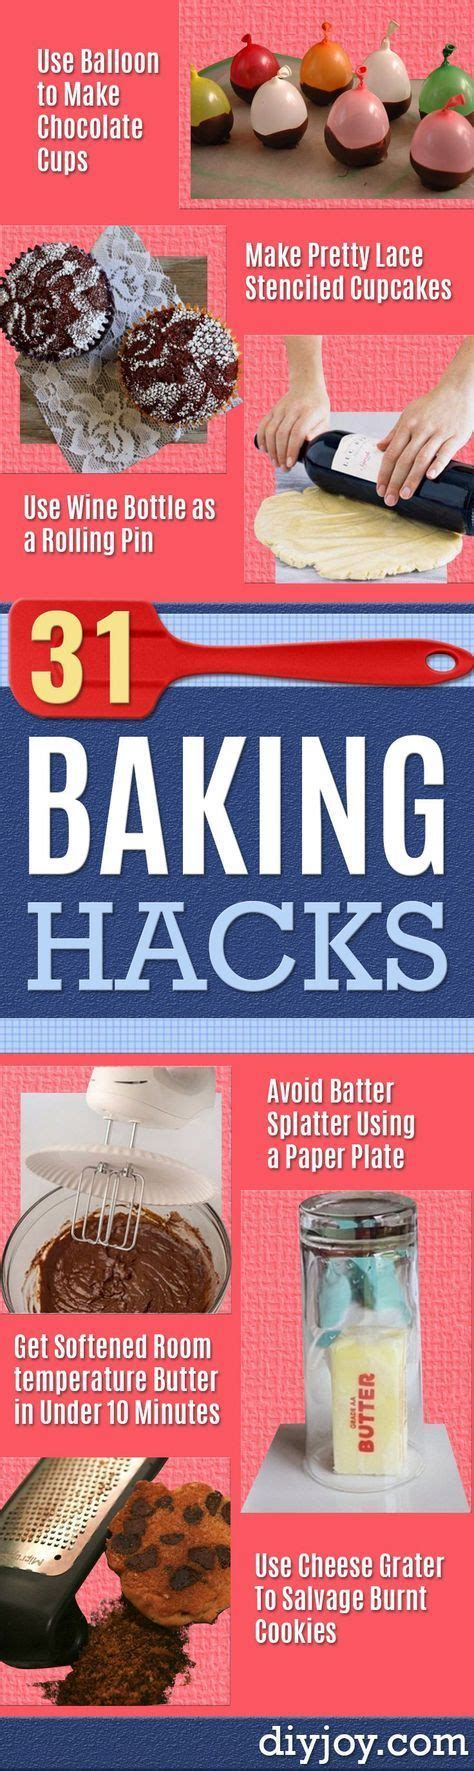 baking hacks best 20 baking tips ideas on pinterest cooking